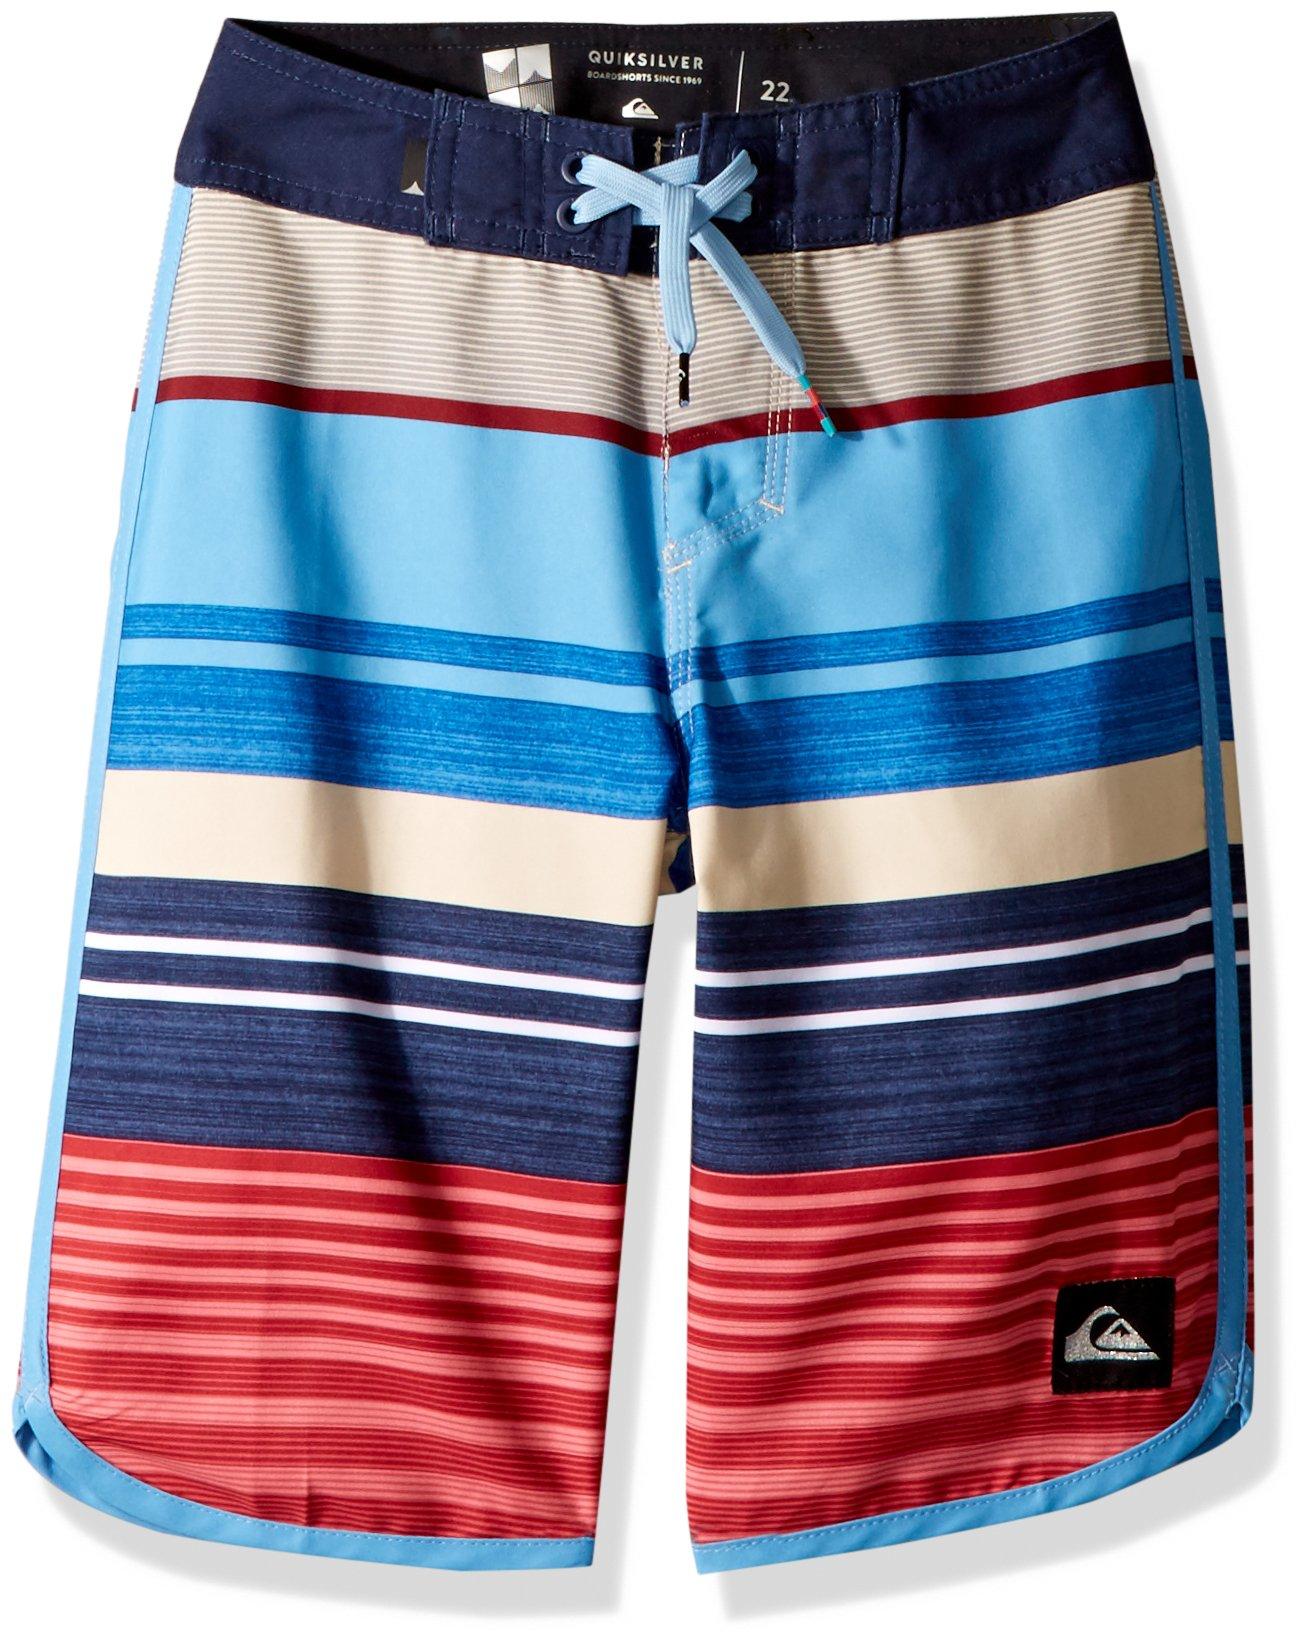 Quiksilver Big Boys' Eye Scallop Youth 19 Boardshort Swim Trunk, Mineral Red, 28/14